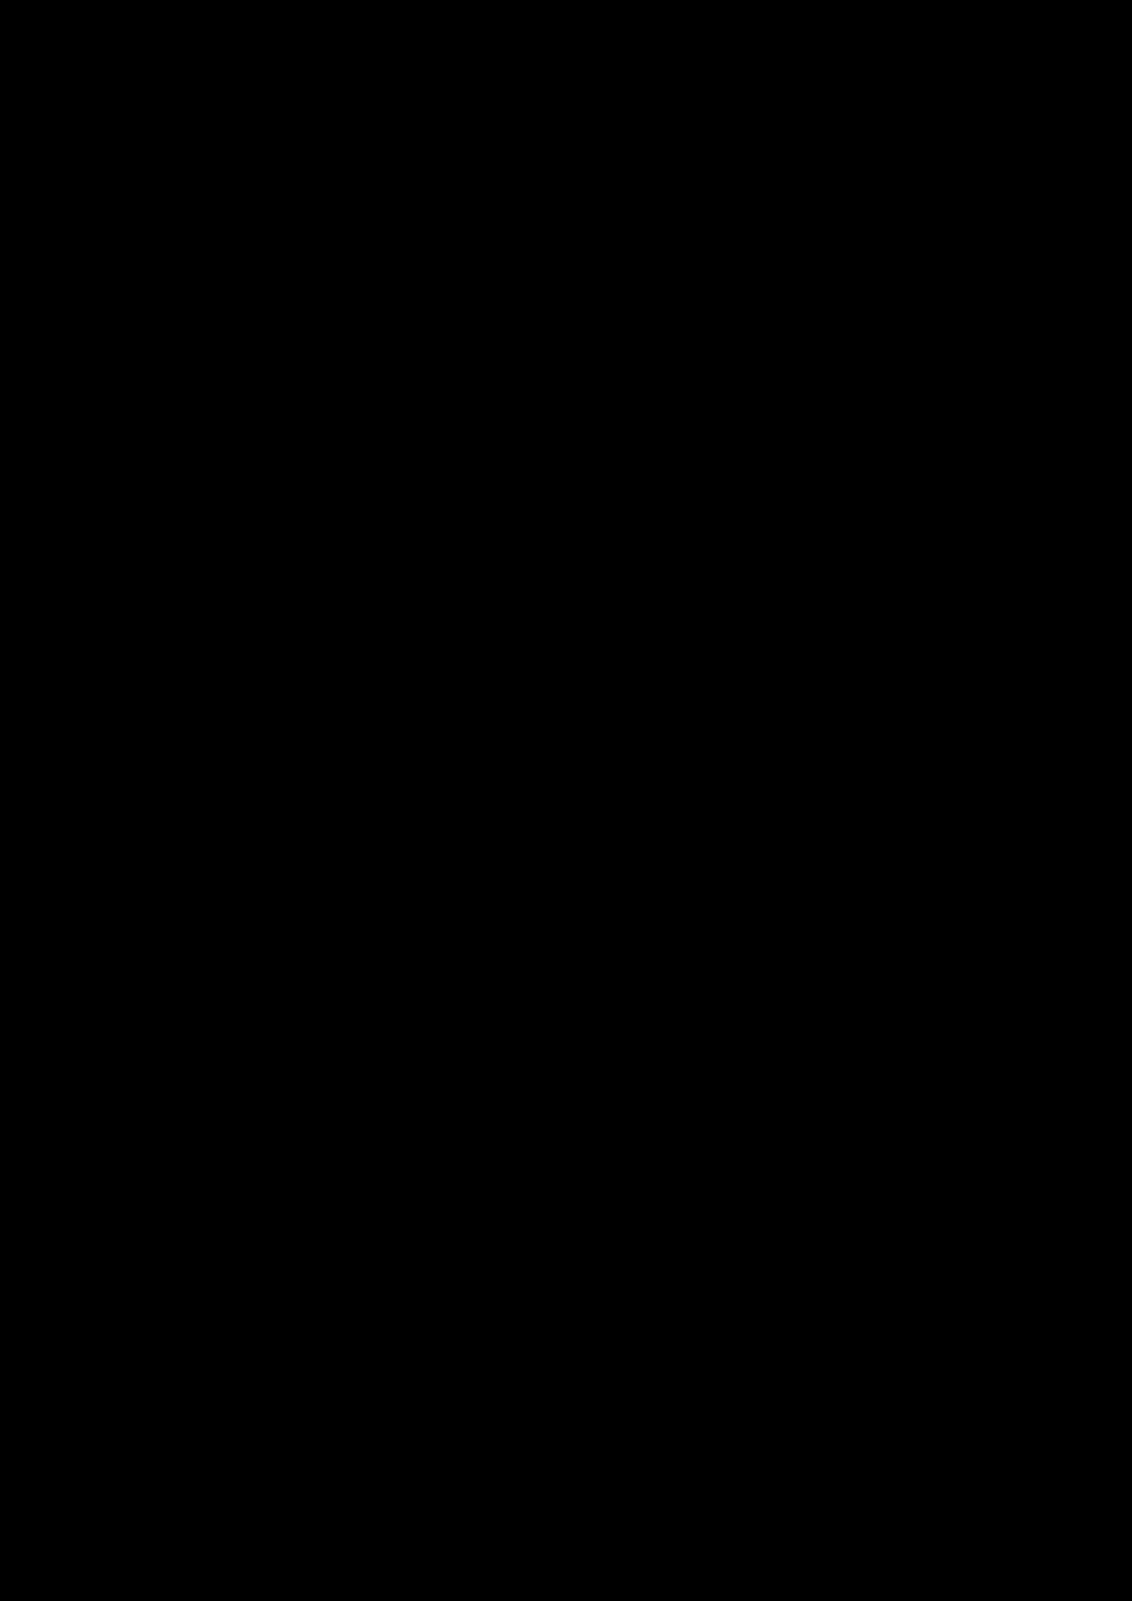 Korolevstvo slez slide, Image 87